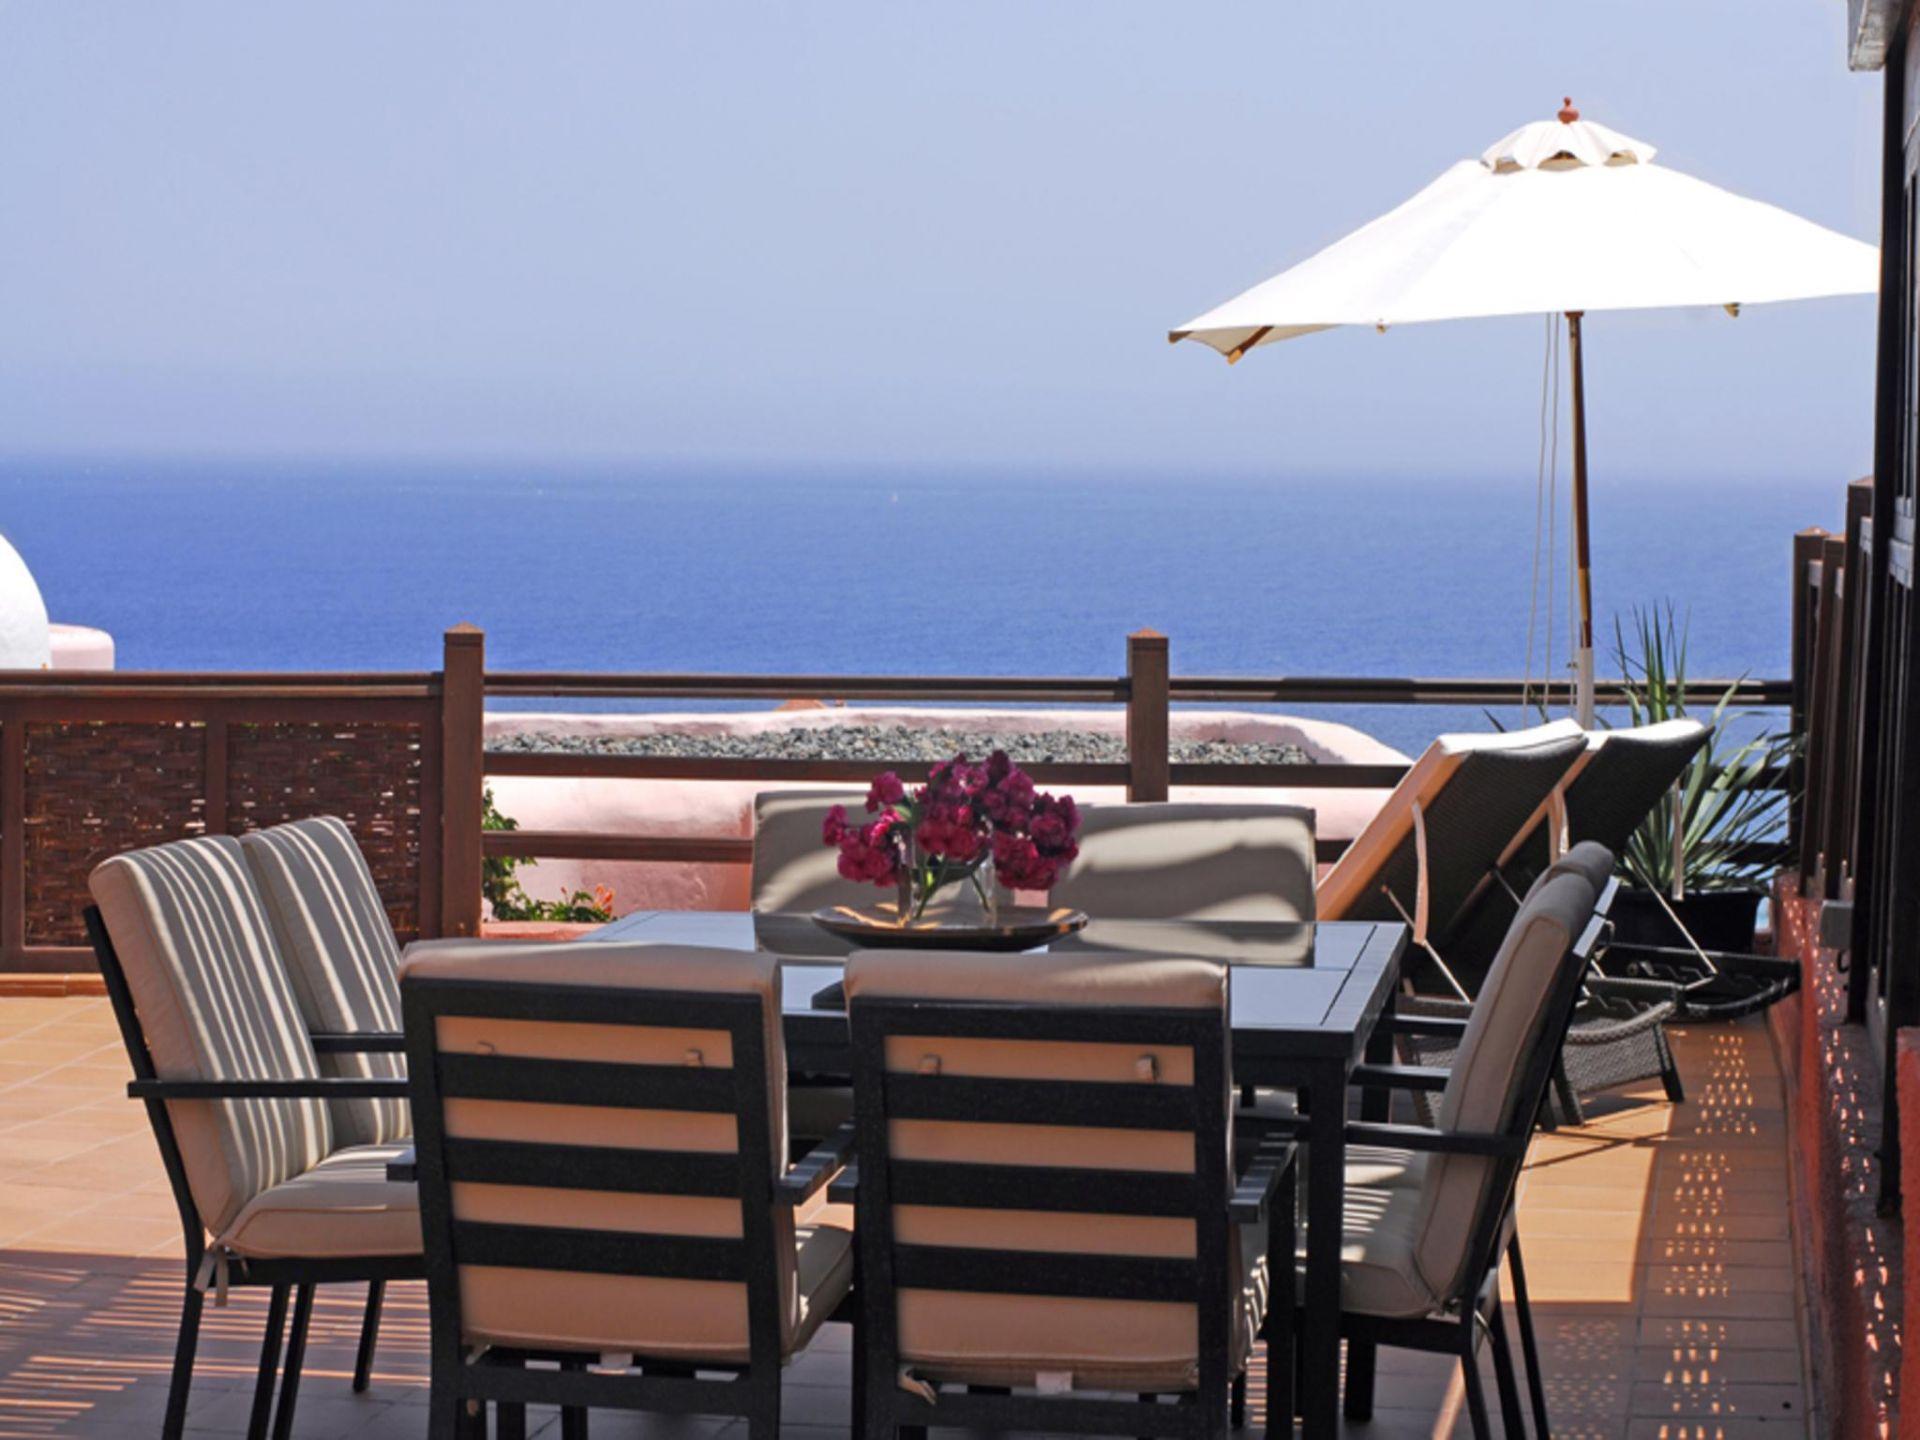 Holiday apartment Villa San Agustin 10 - Holiday Rental (854295), Maspalomas, Gran Canaria, Canary Islands, Spain, picture 2